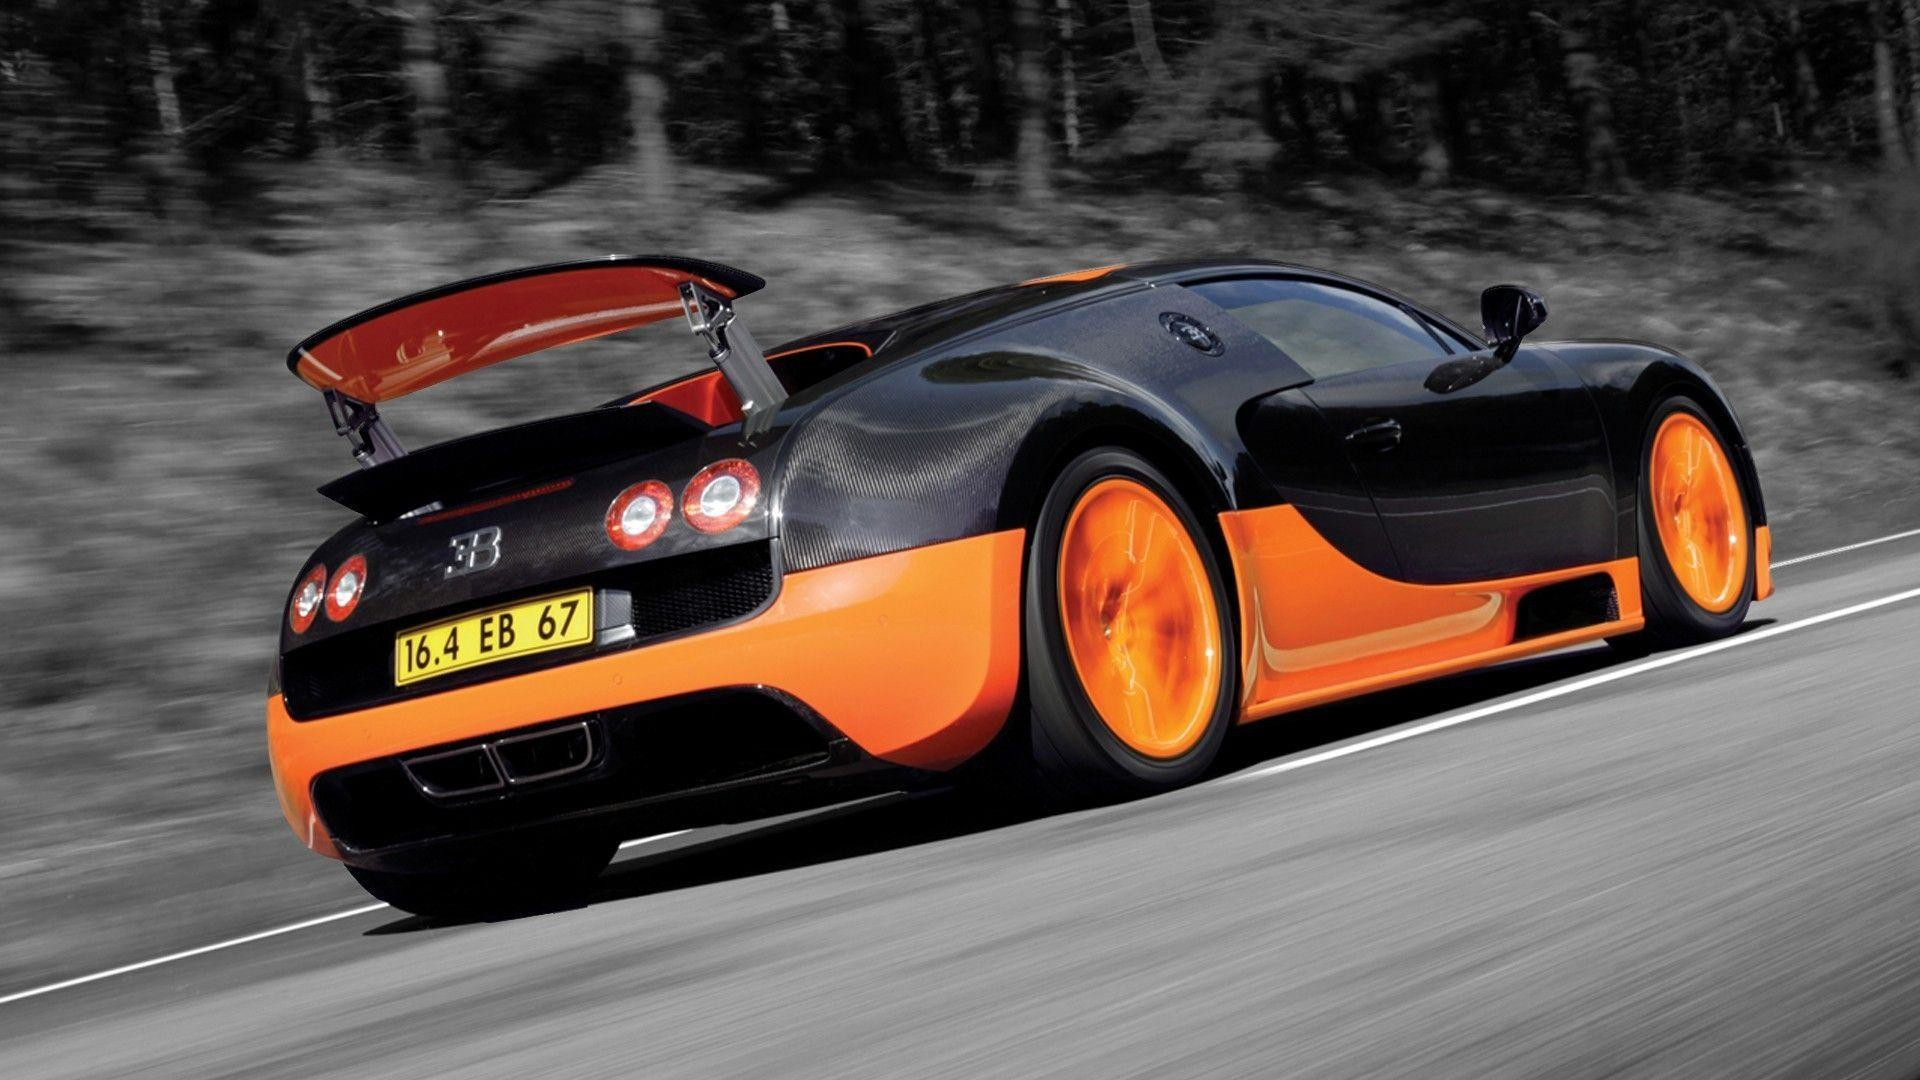 Bugatti Veyron Super Sport Wallpaper Wallpapertag